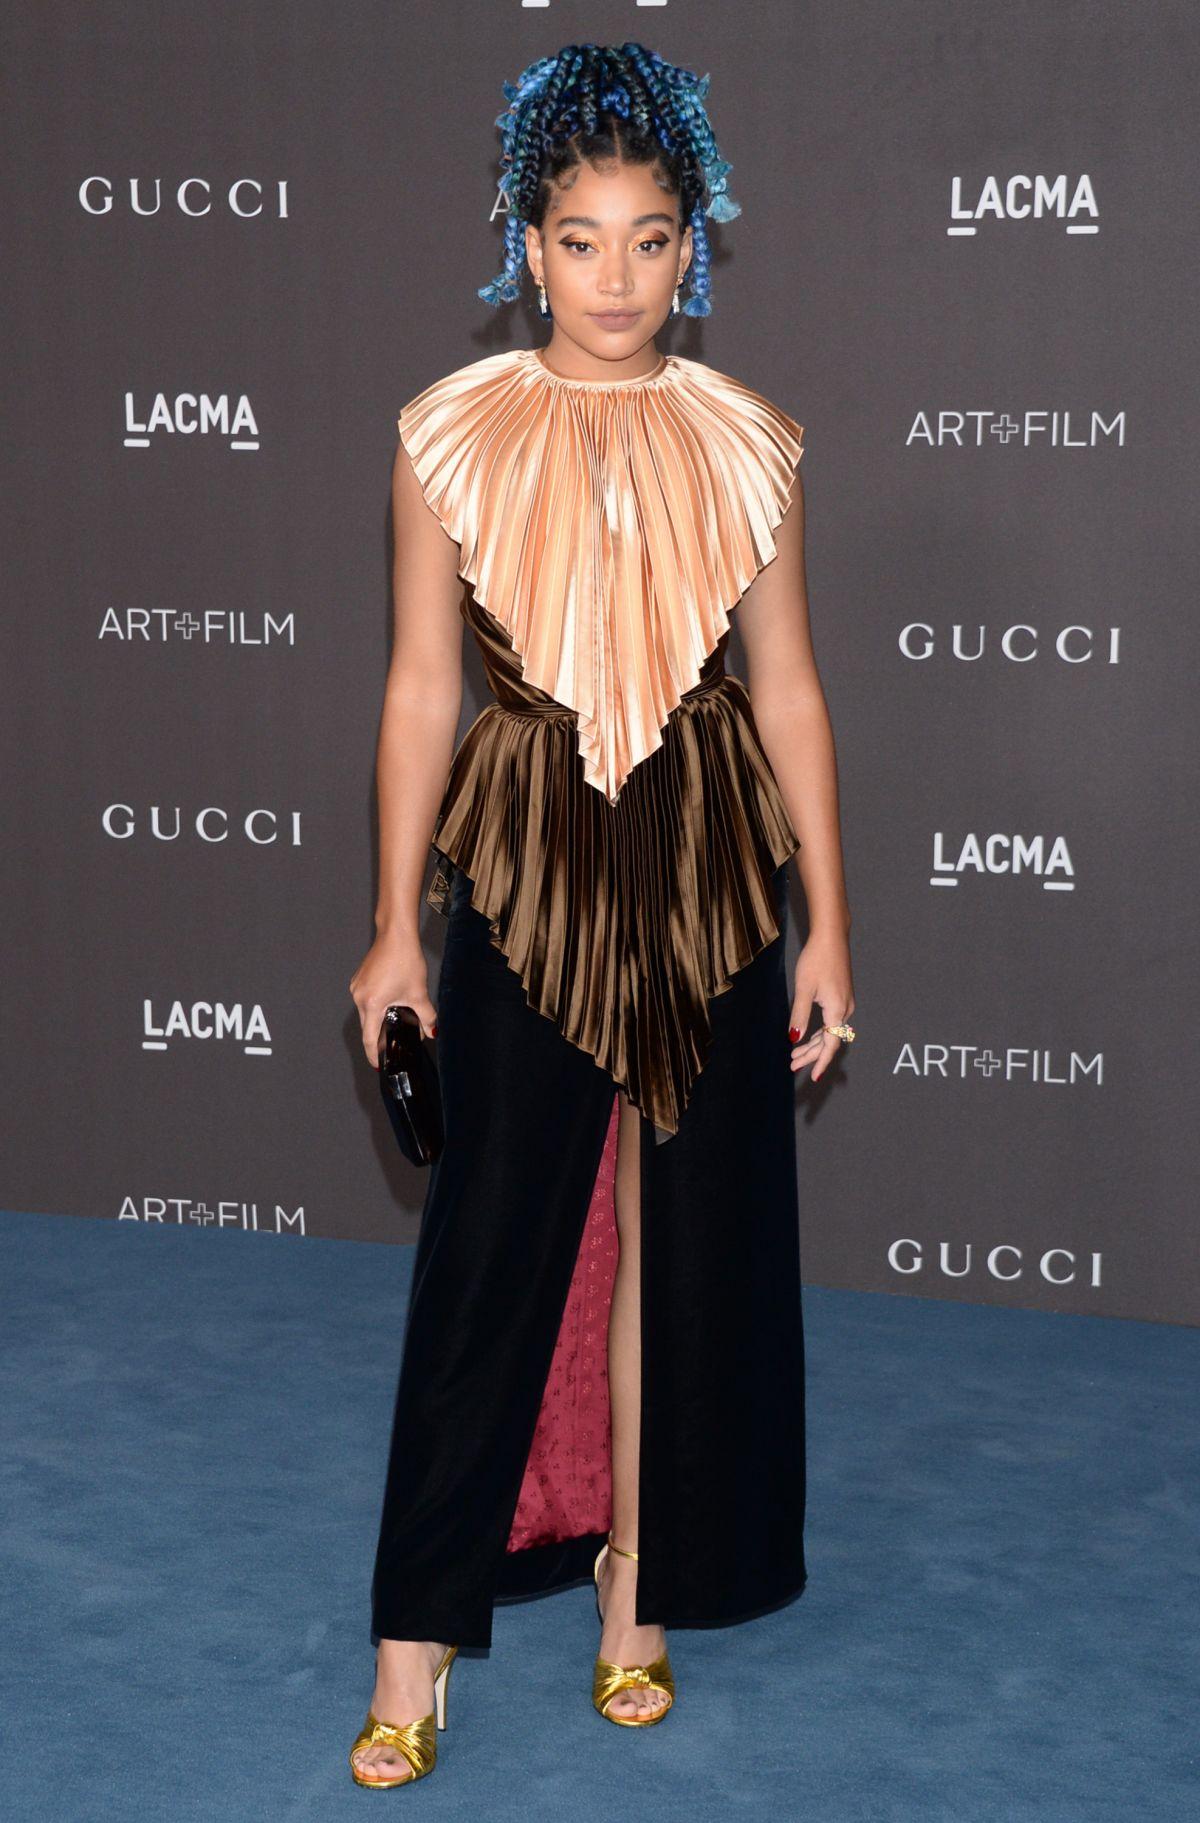 amandla-stenberg-in-gucci-2019-lacma-art-and-film-gala